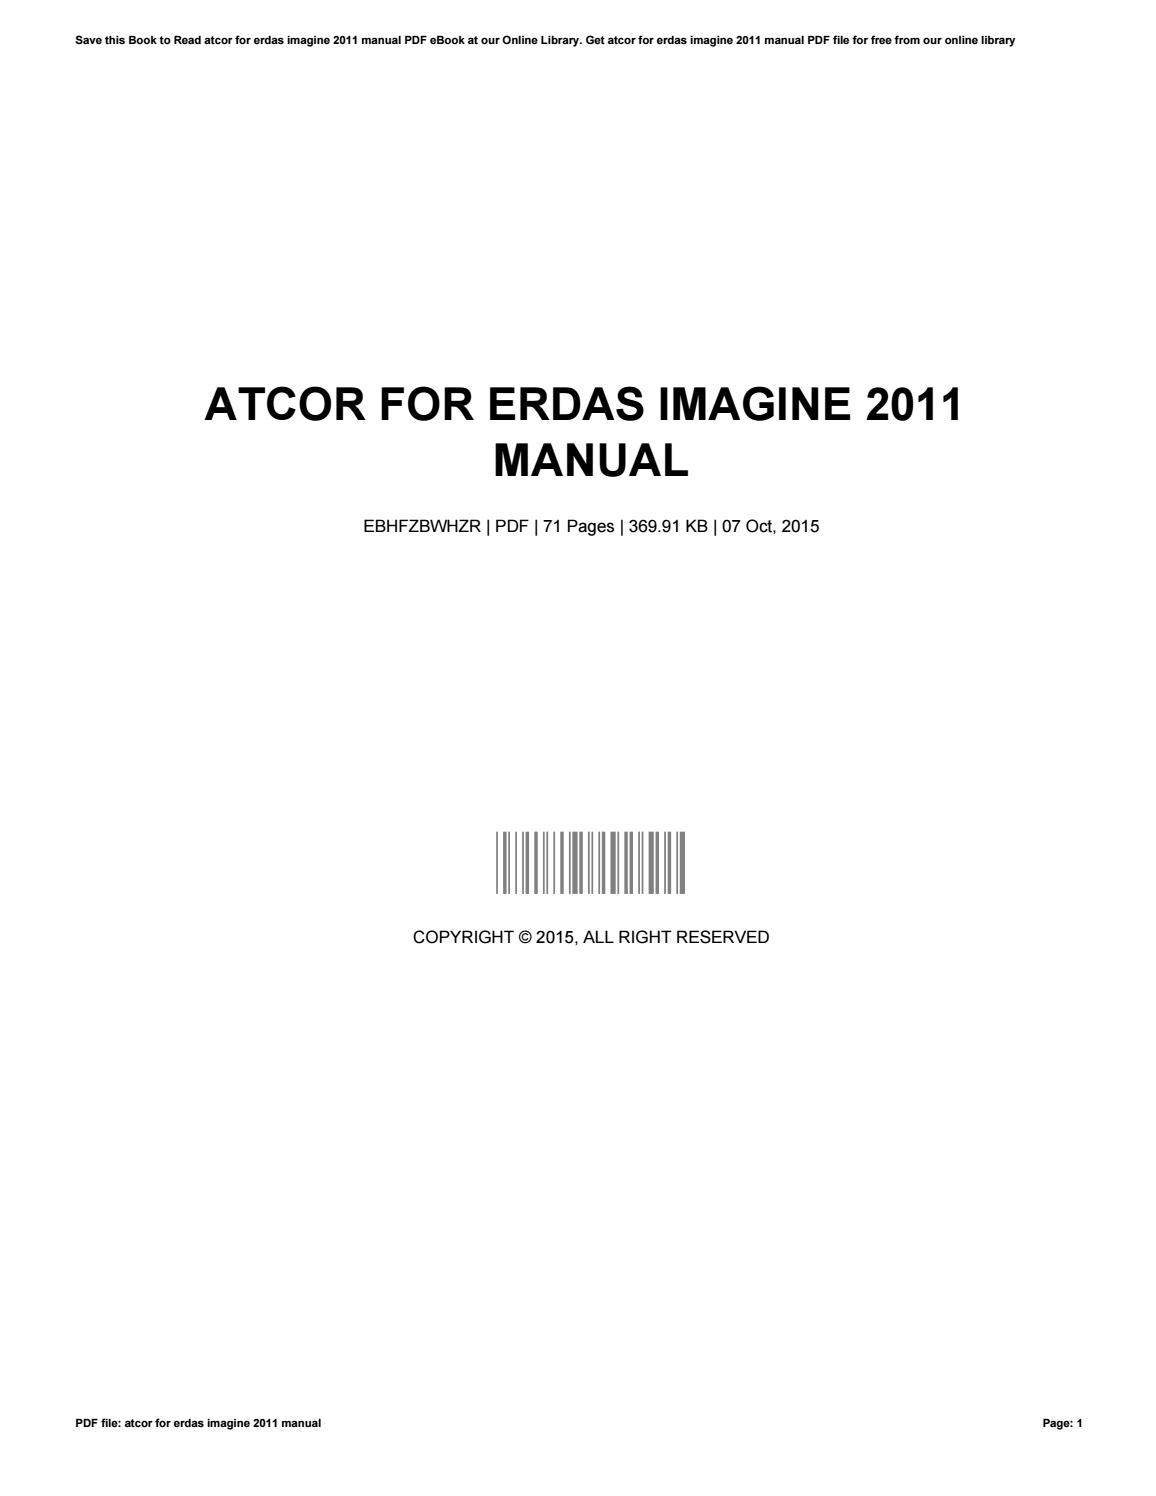 erdas imagine 2015 crack free download